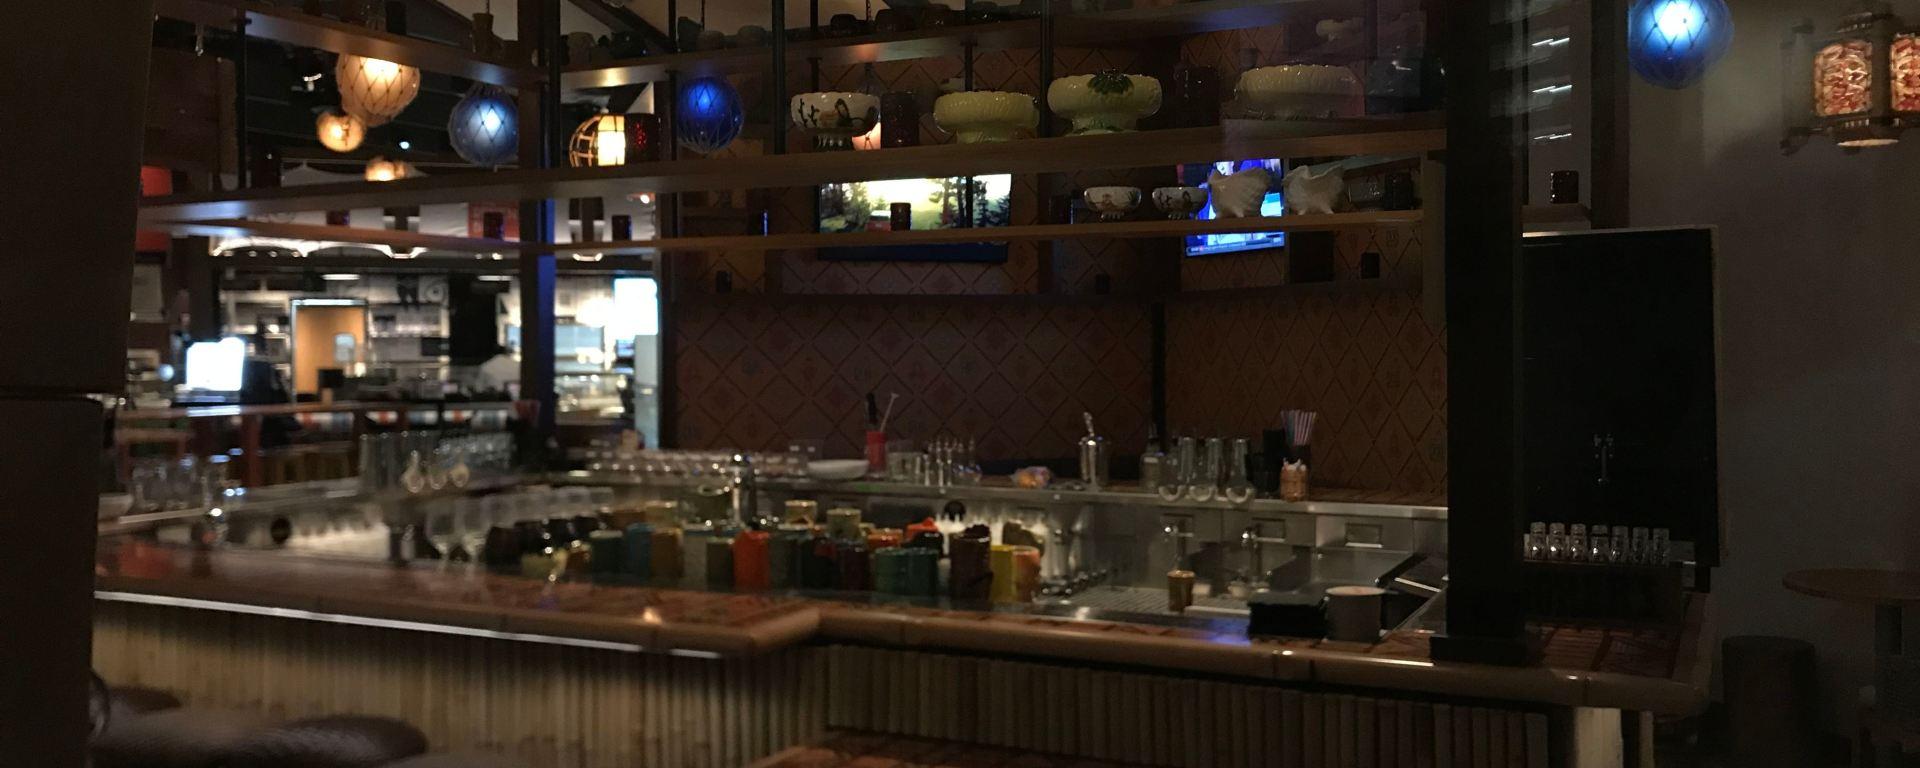 The Myna Bird, a New Tiki Bar Coming to Honolulu – Critiki ... - photo#2